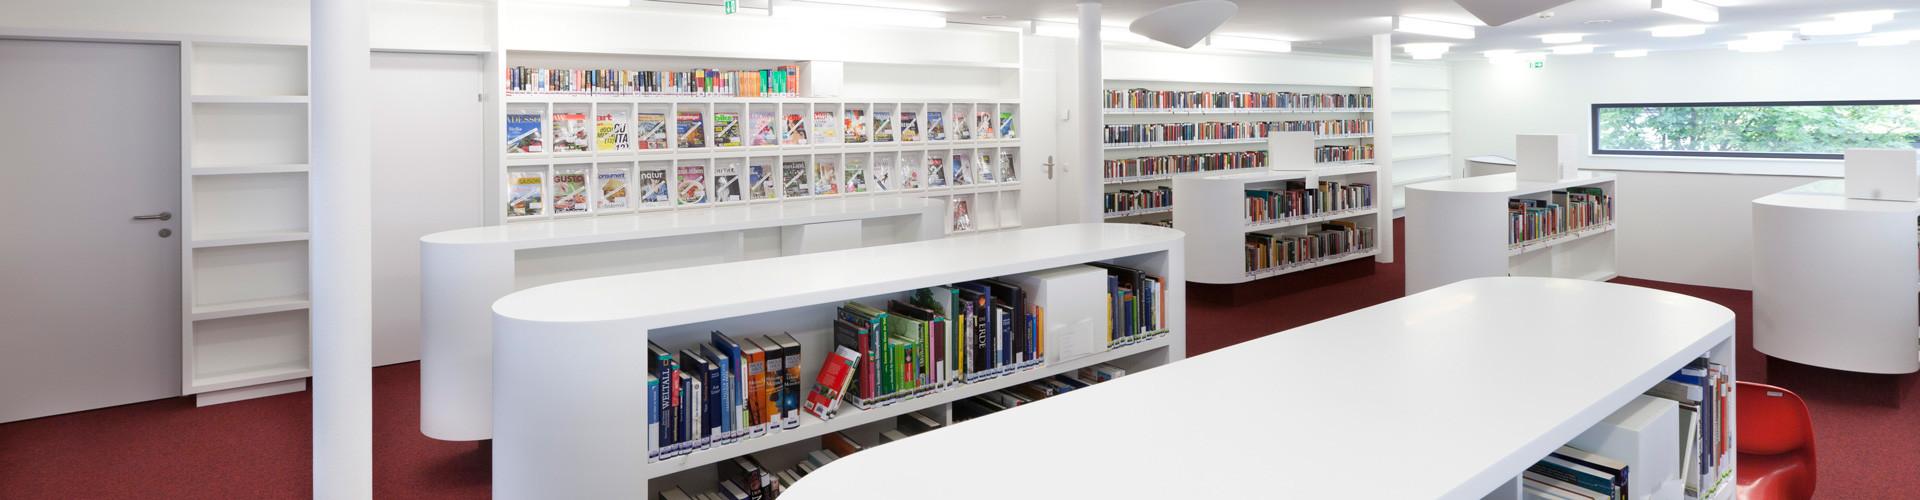 Blick in die AK-Bibliothek Bludenz © Dietmar Walser, Fotograf